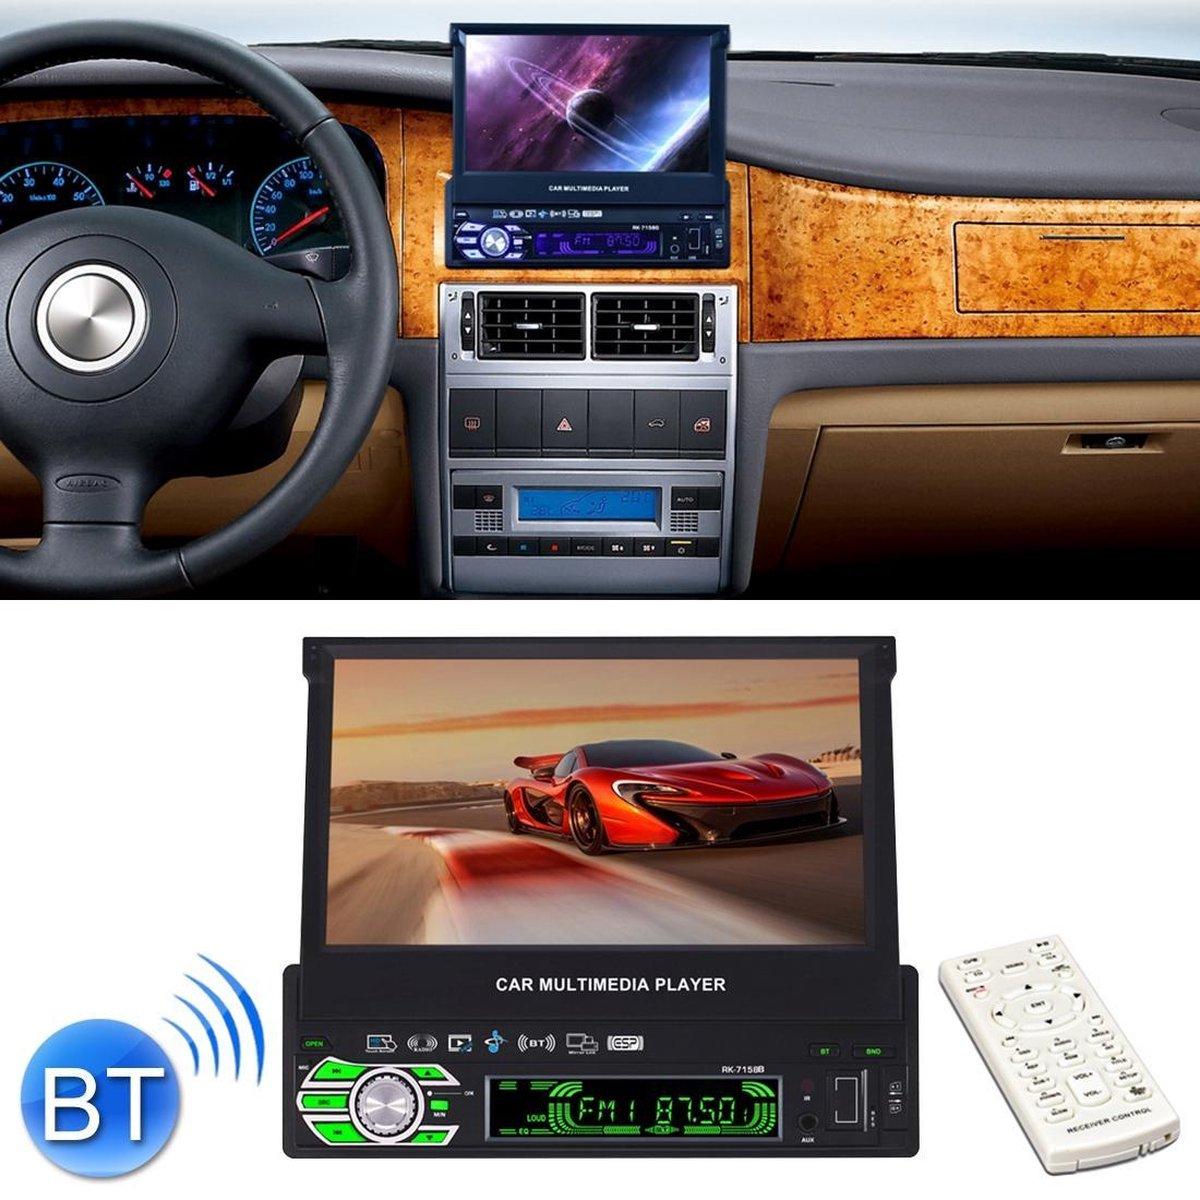 RK-7158B Enkelvoudig automatisch intrekbaar scherm 7 inch 1080P HD autoradio radio MP5 FM-speler In-Dash hoofdunit, met Bluetooth / AUX / Achteraanzicht